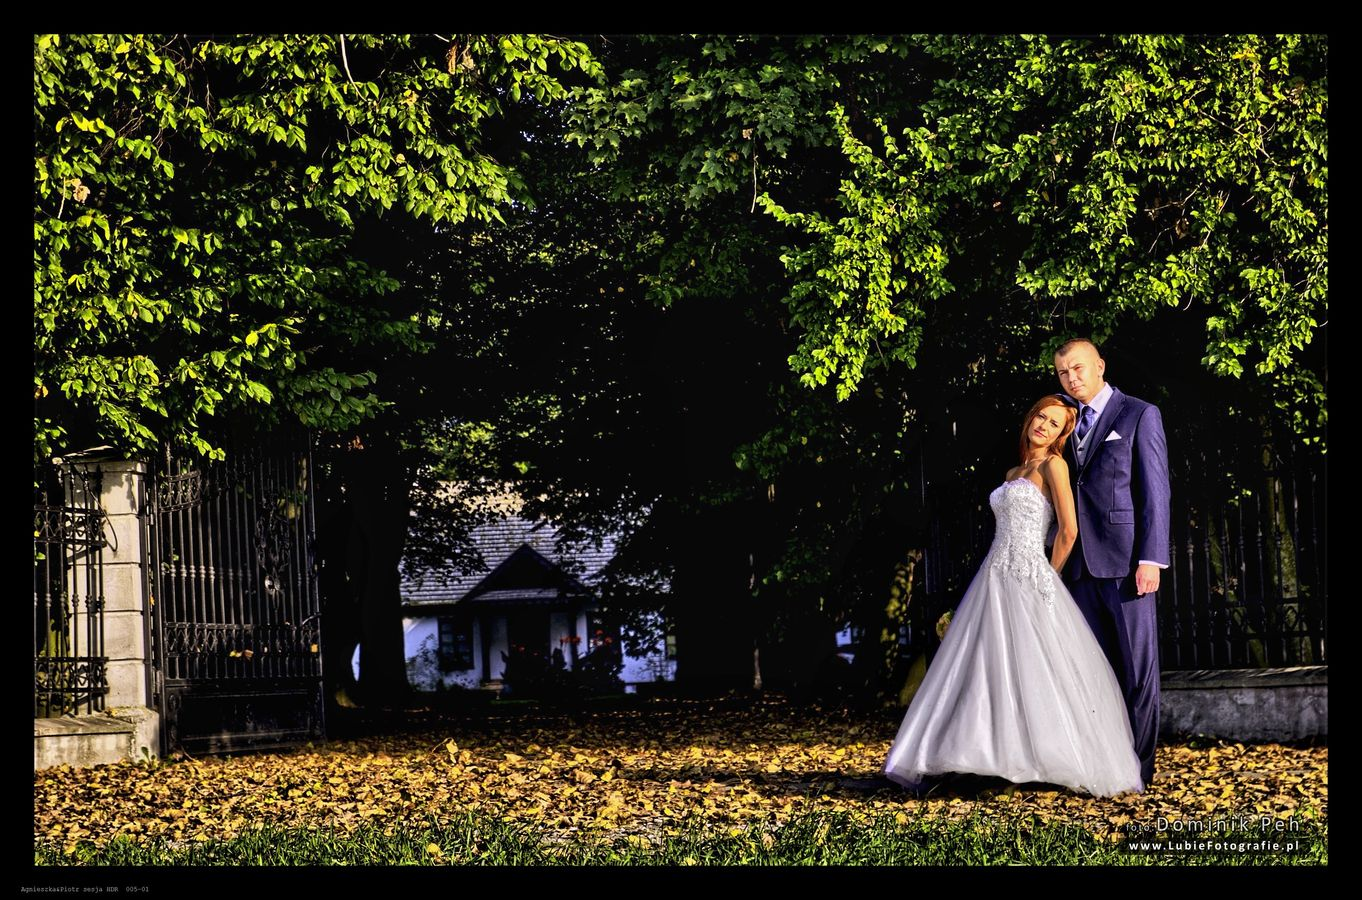 Agnieszka&Piotr  0094